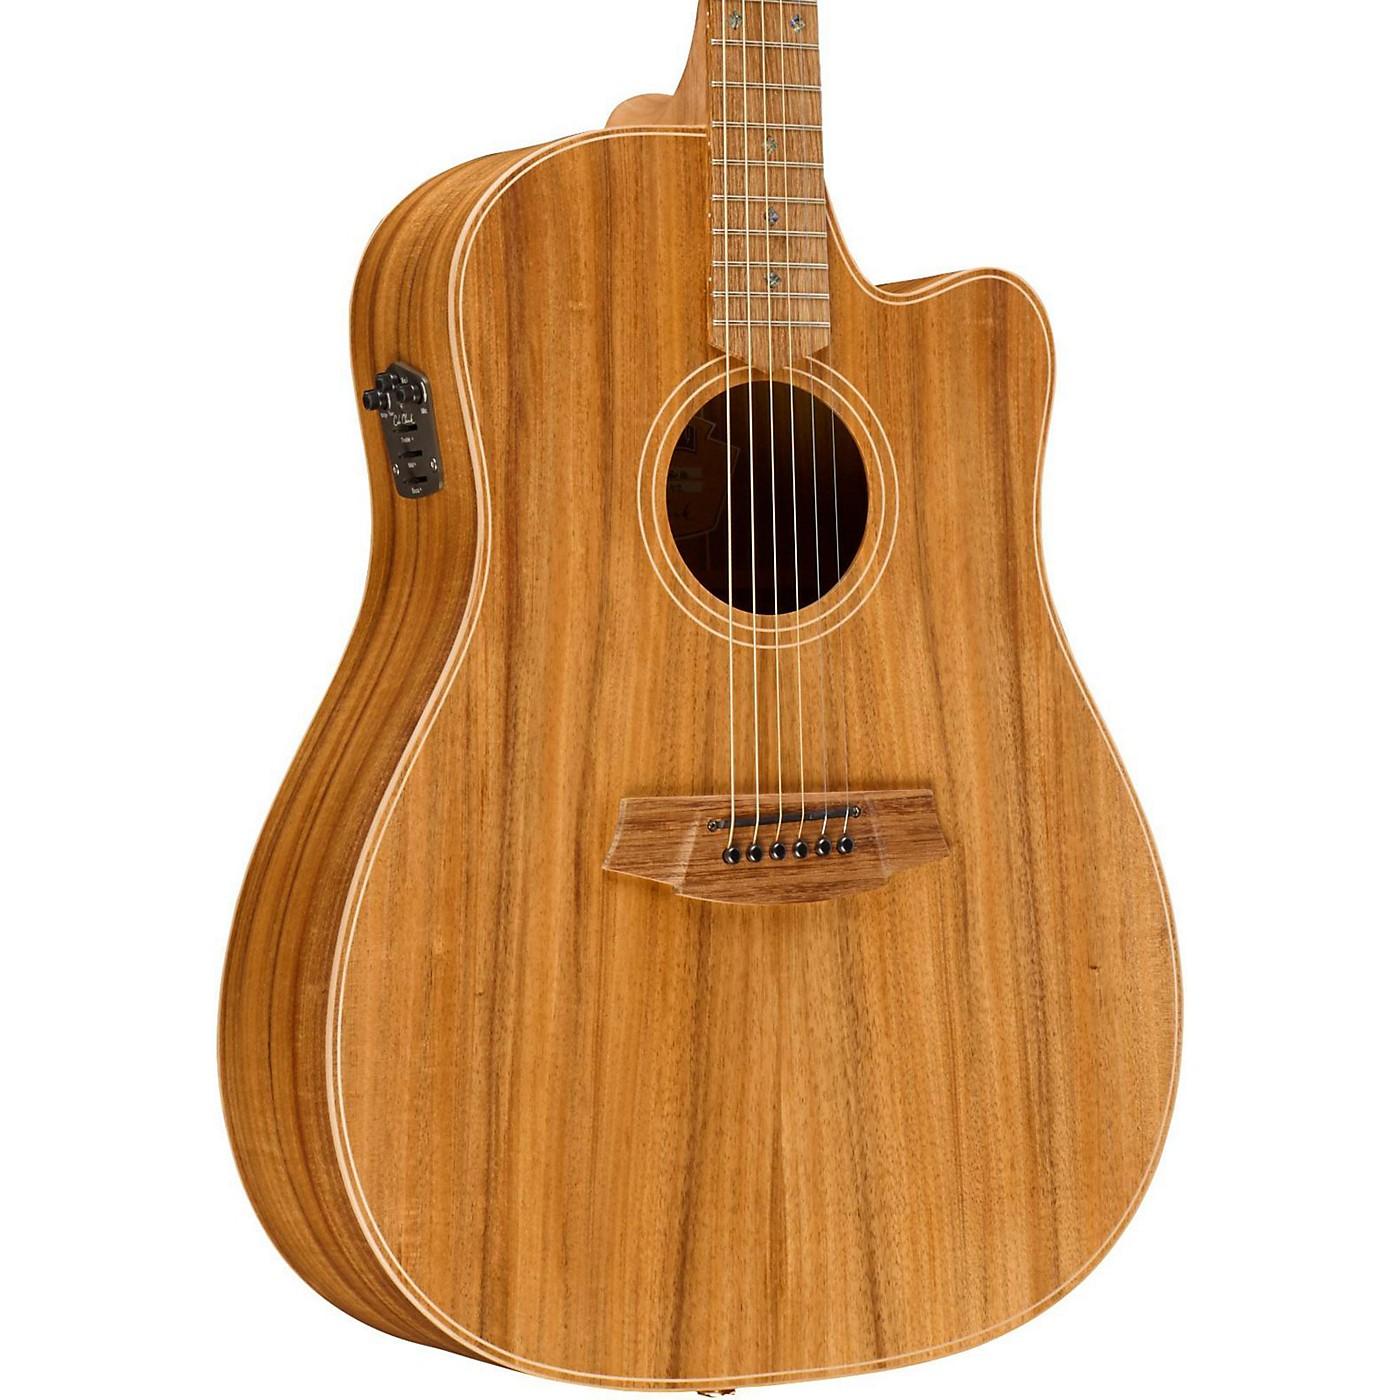 Cole Clark Fat Lady 2 Series Australian Eco Blackwood Dreadnought Acoustic-Electric Guitar thumbnail